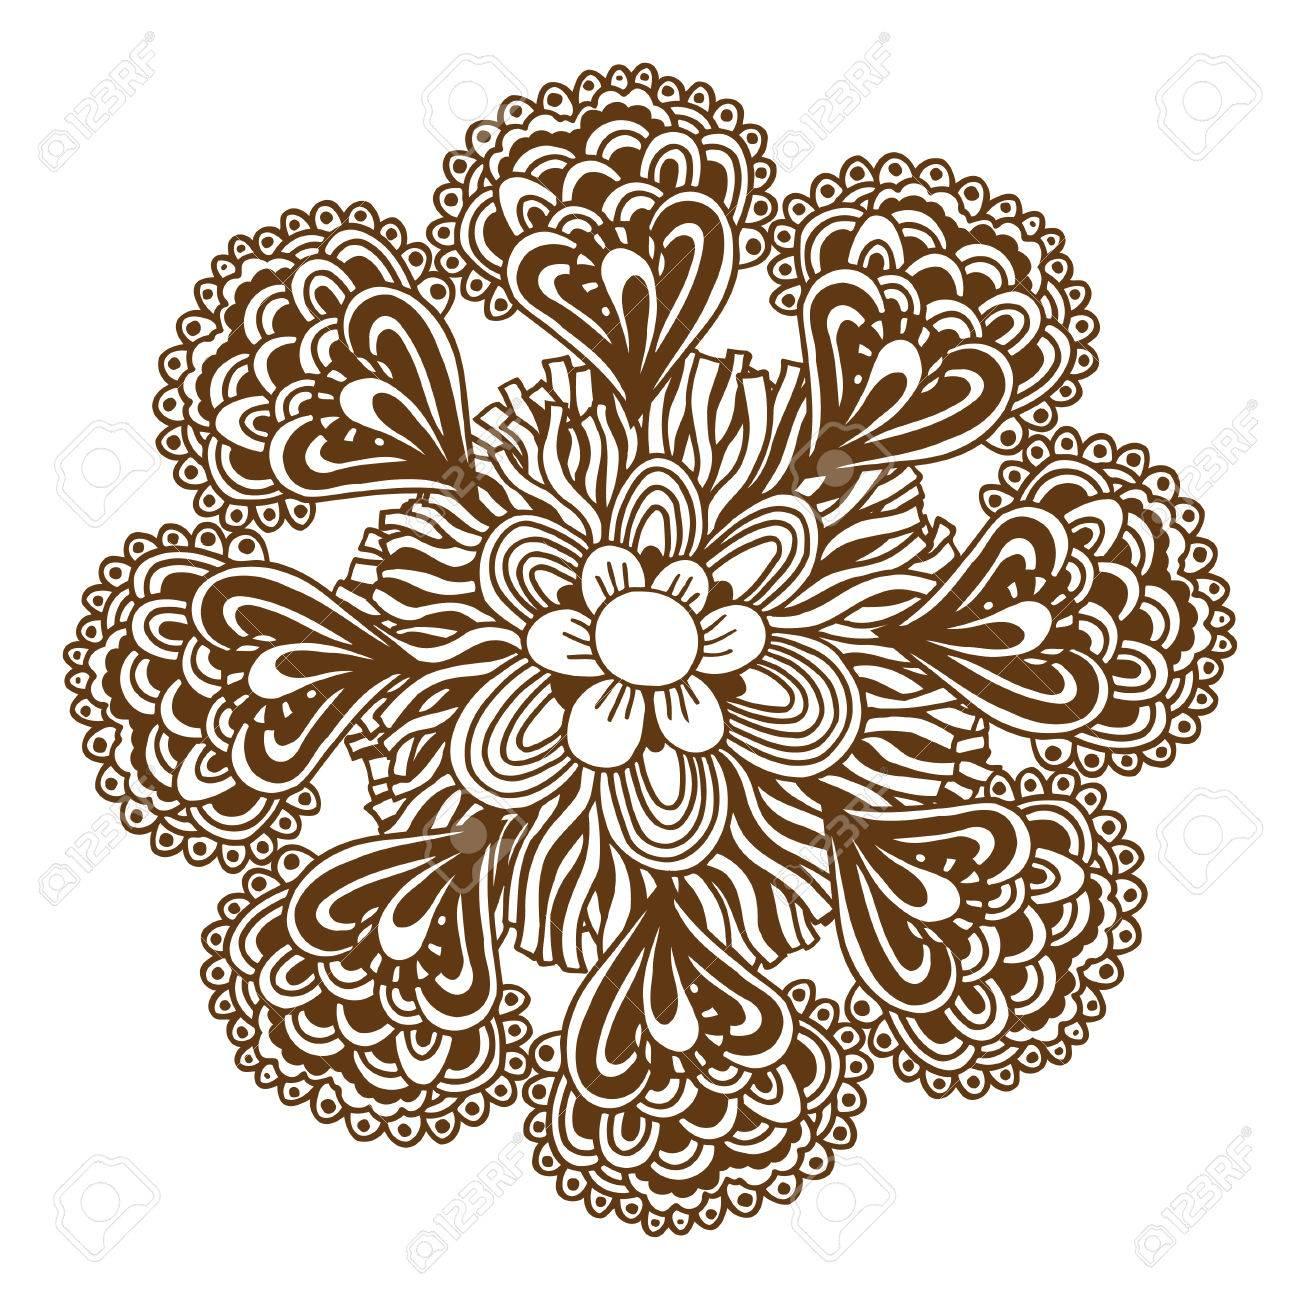 3b351f1c5 Circular floral ornament Mehndi Henna Tattoo Mandala, Yantra brown. Vintage  vector banner frame card